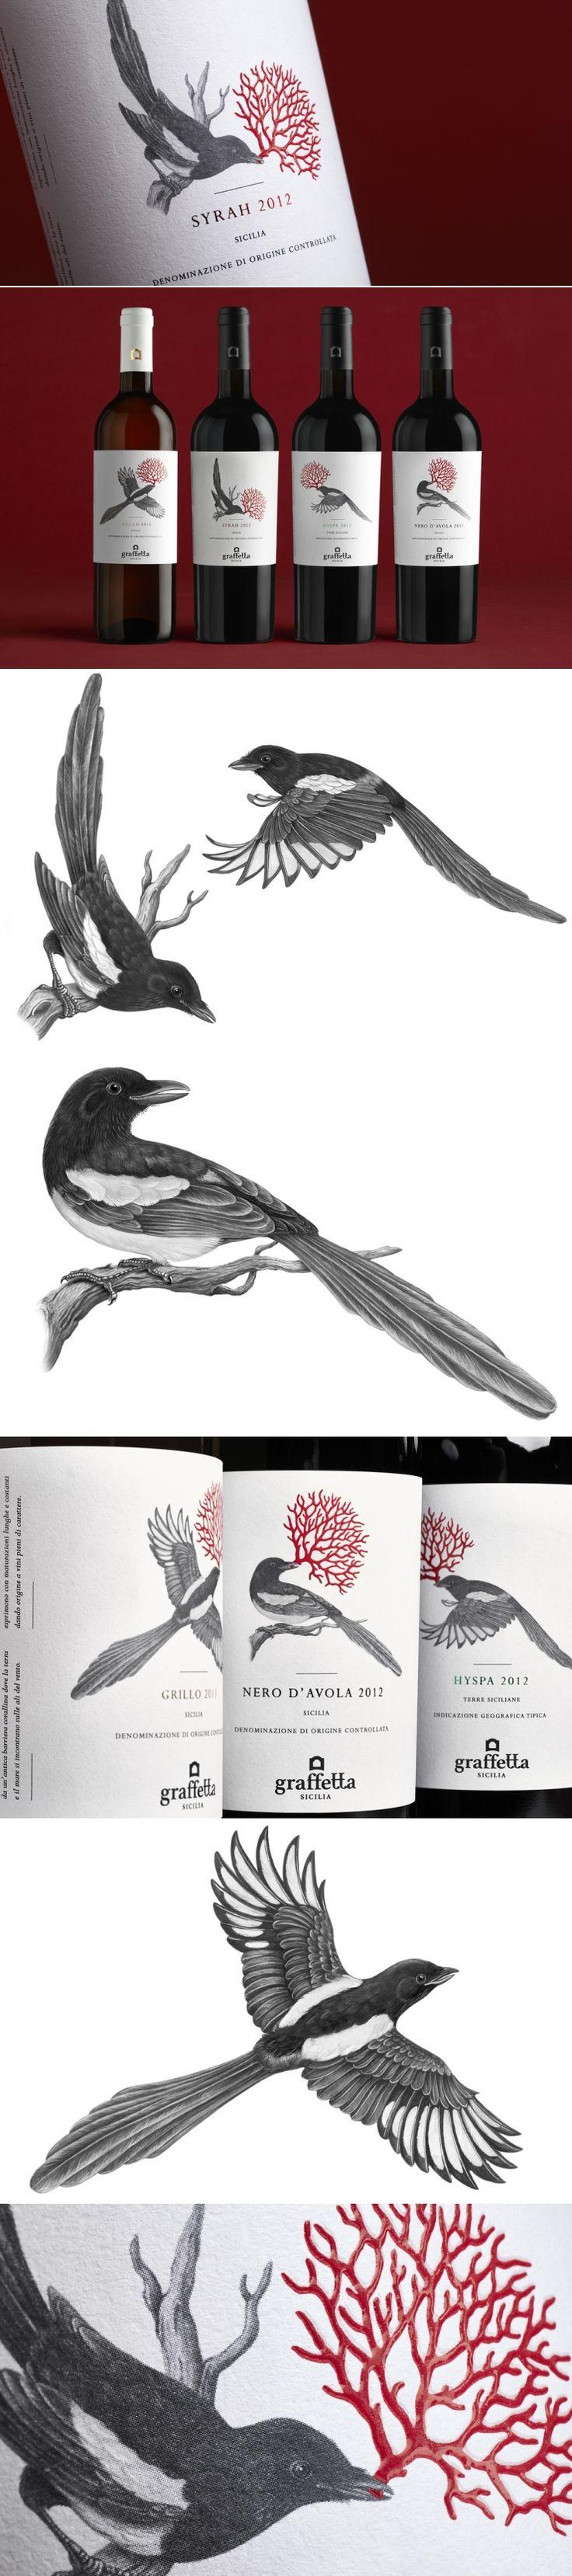 Poggia Graffetta — The Dieline | Packaging & Branding Design & Innovation News